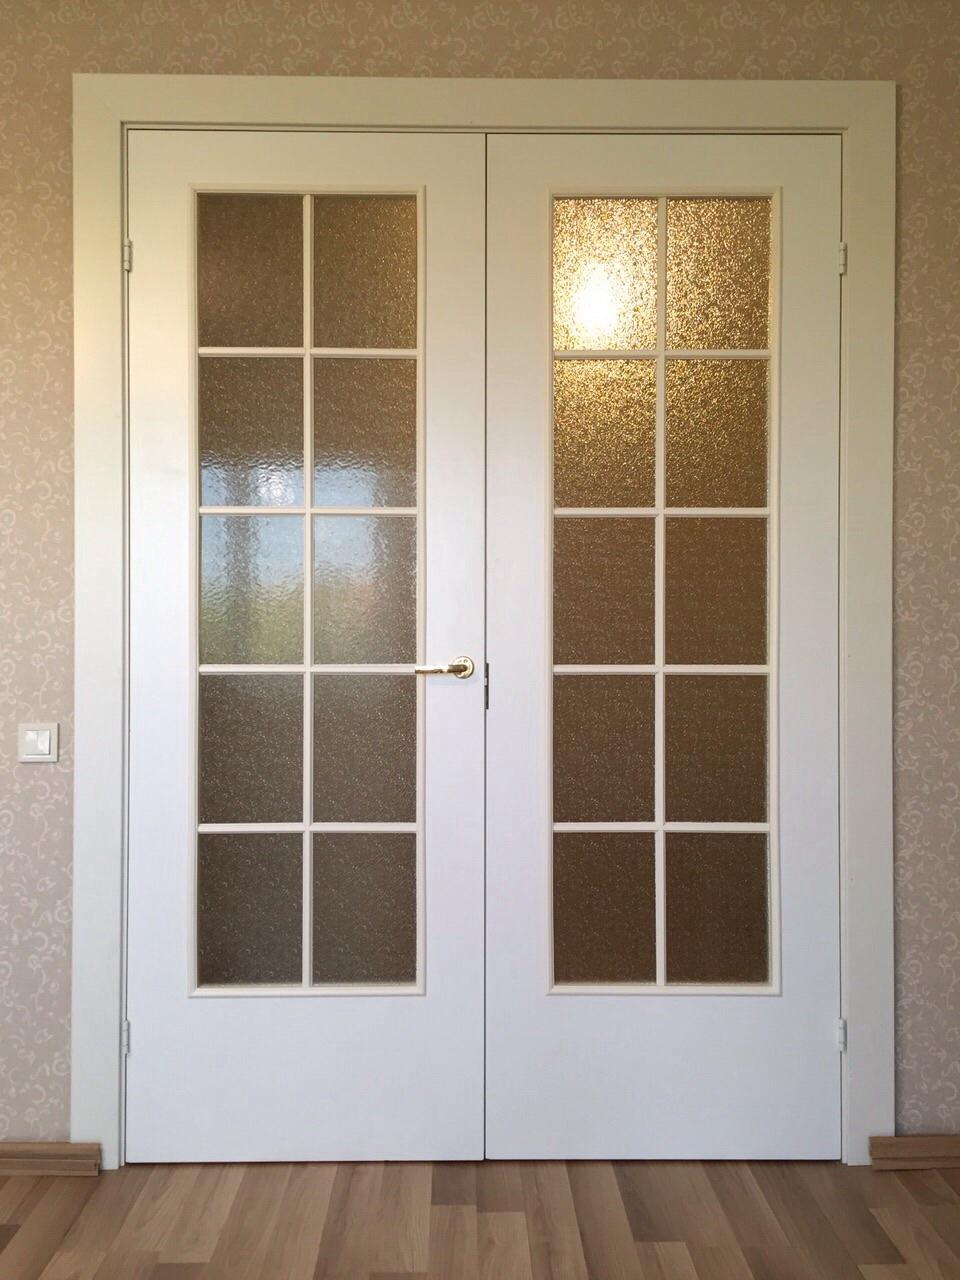 rvkoks_vnutrennie_dveri_8.jpg